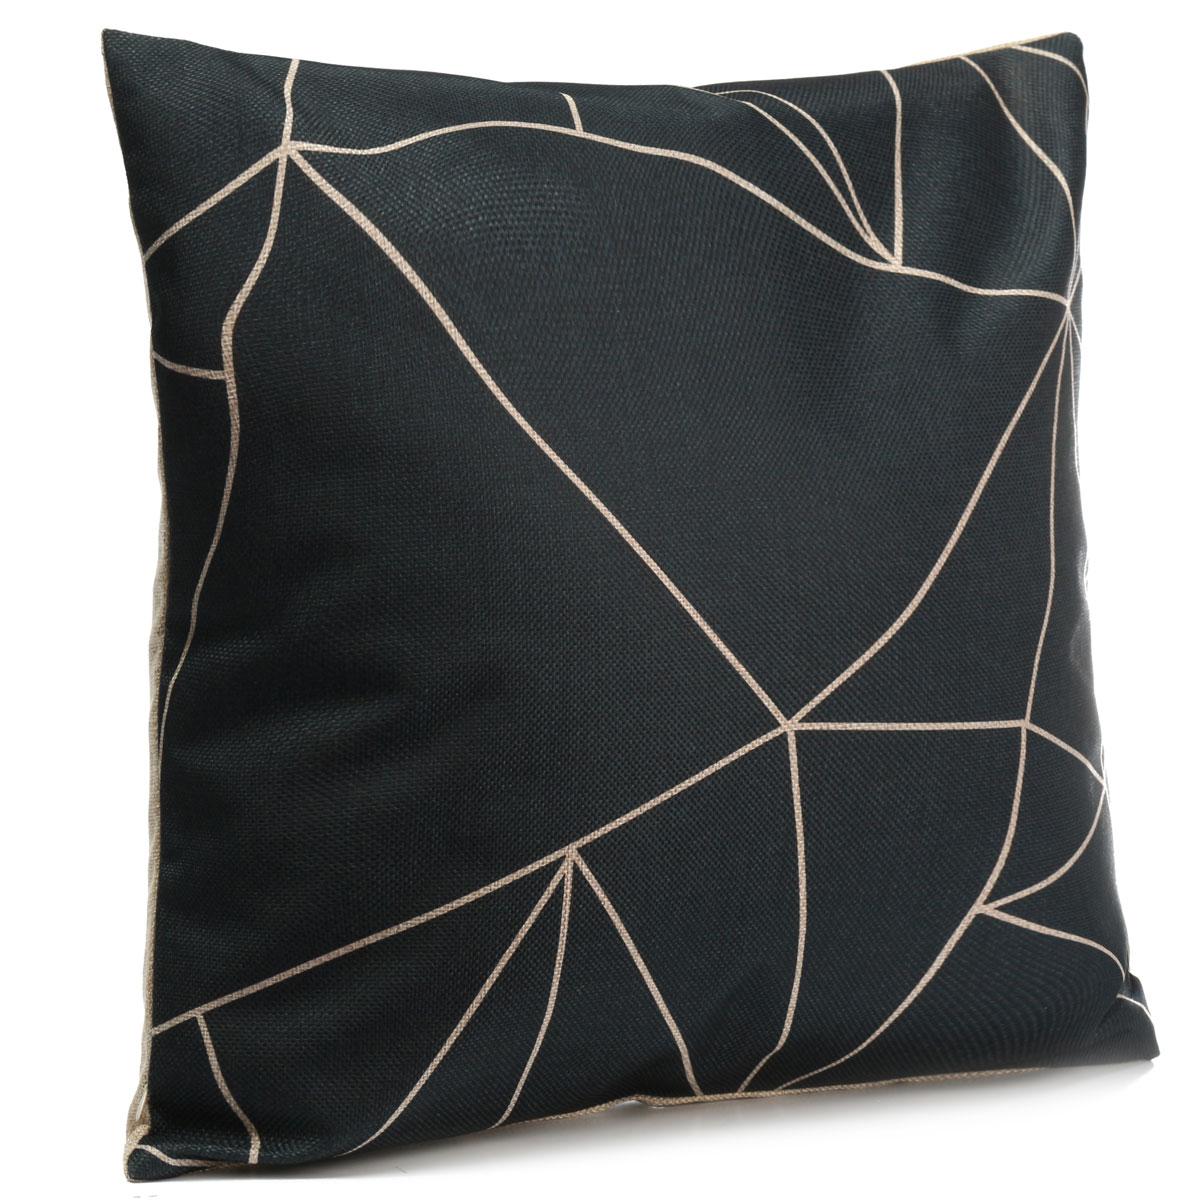 How To Wash Throw Pillow Cases : Vintage Black & White Cotton Linen Throw Cushion Cover Pillow Case Home Decor Lazada Malaysia